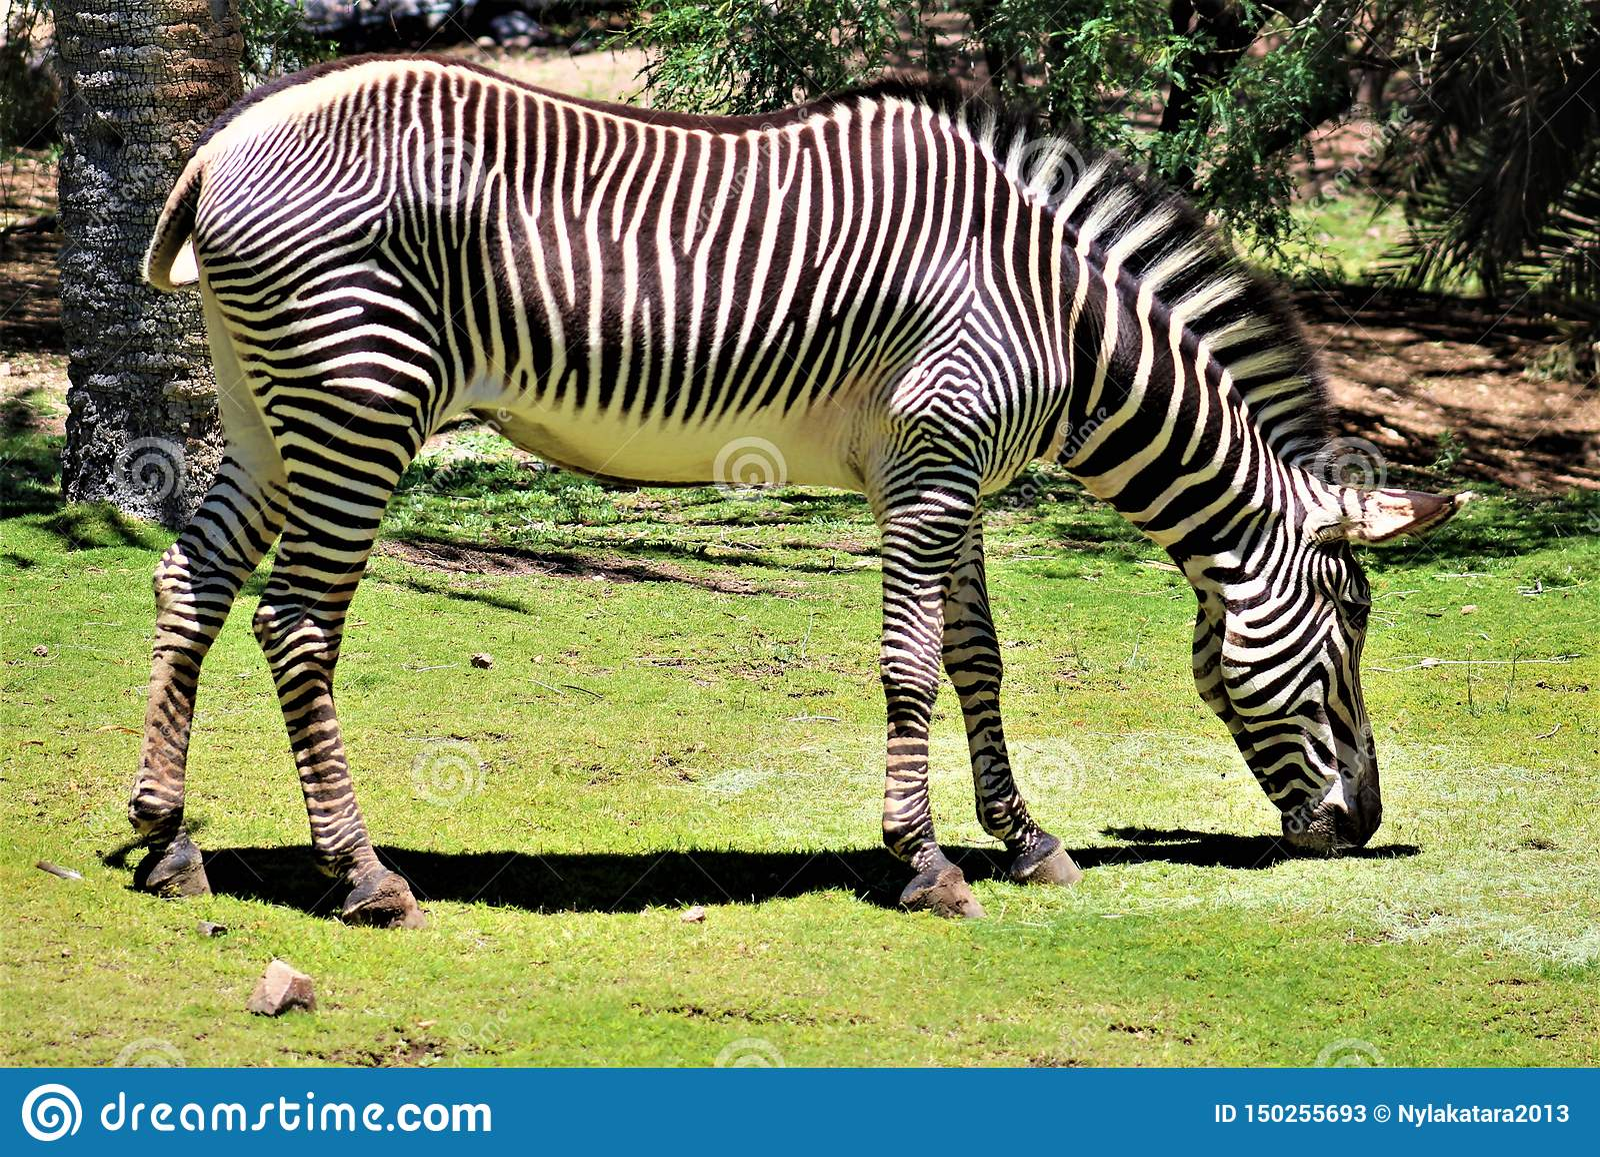 Zebra, Phoenix Zoo, Arizona Center for Nature Conservation, Phoenix, Arizona, United States